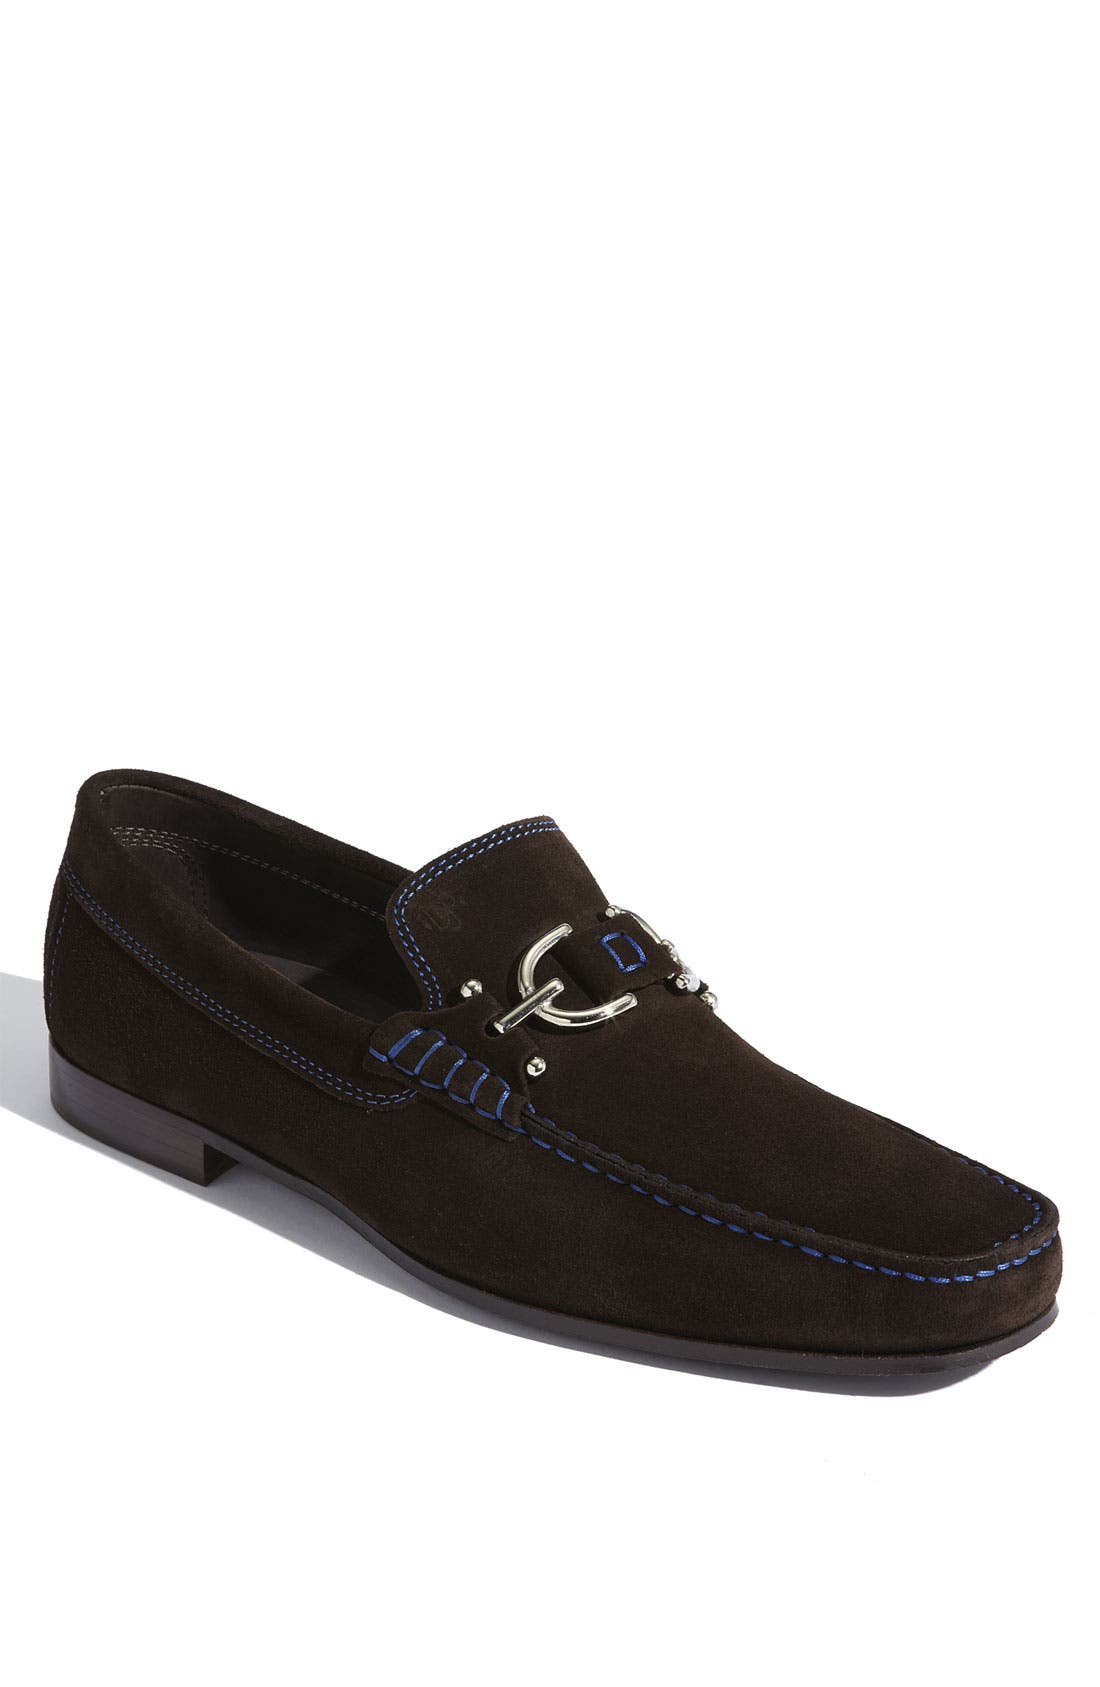 DONALD J PLINER 'Dacio II' Loafer